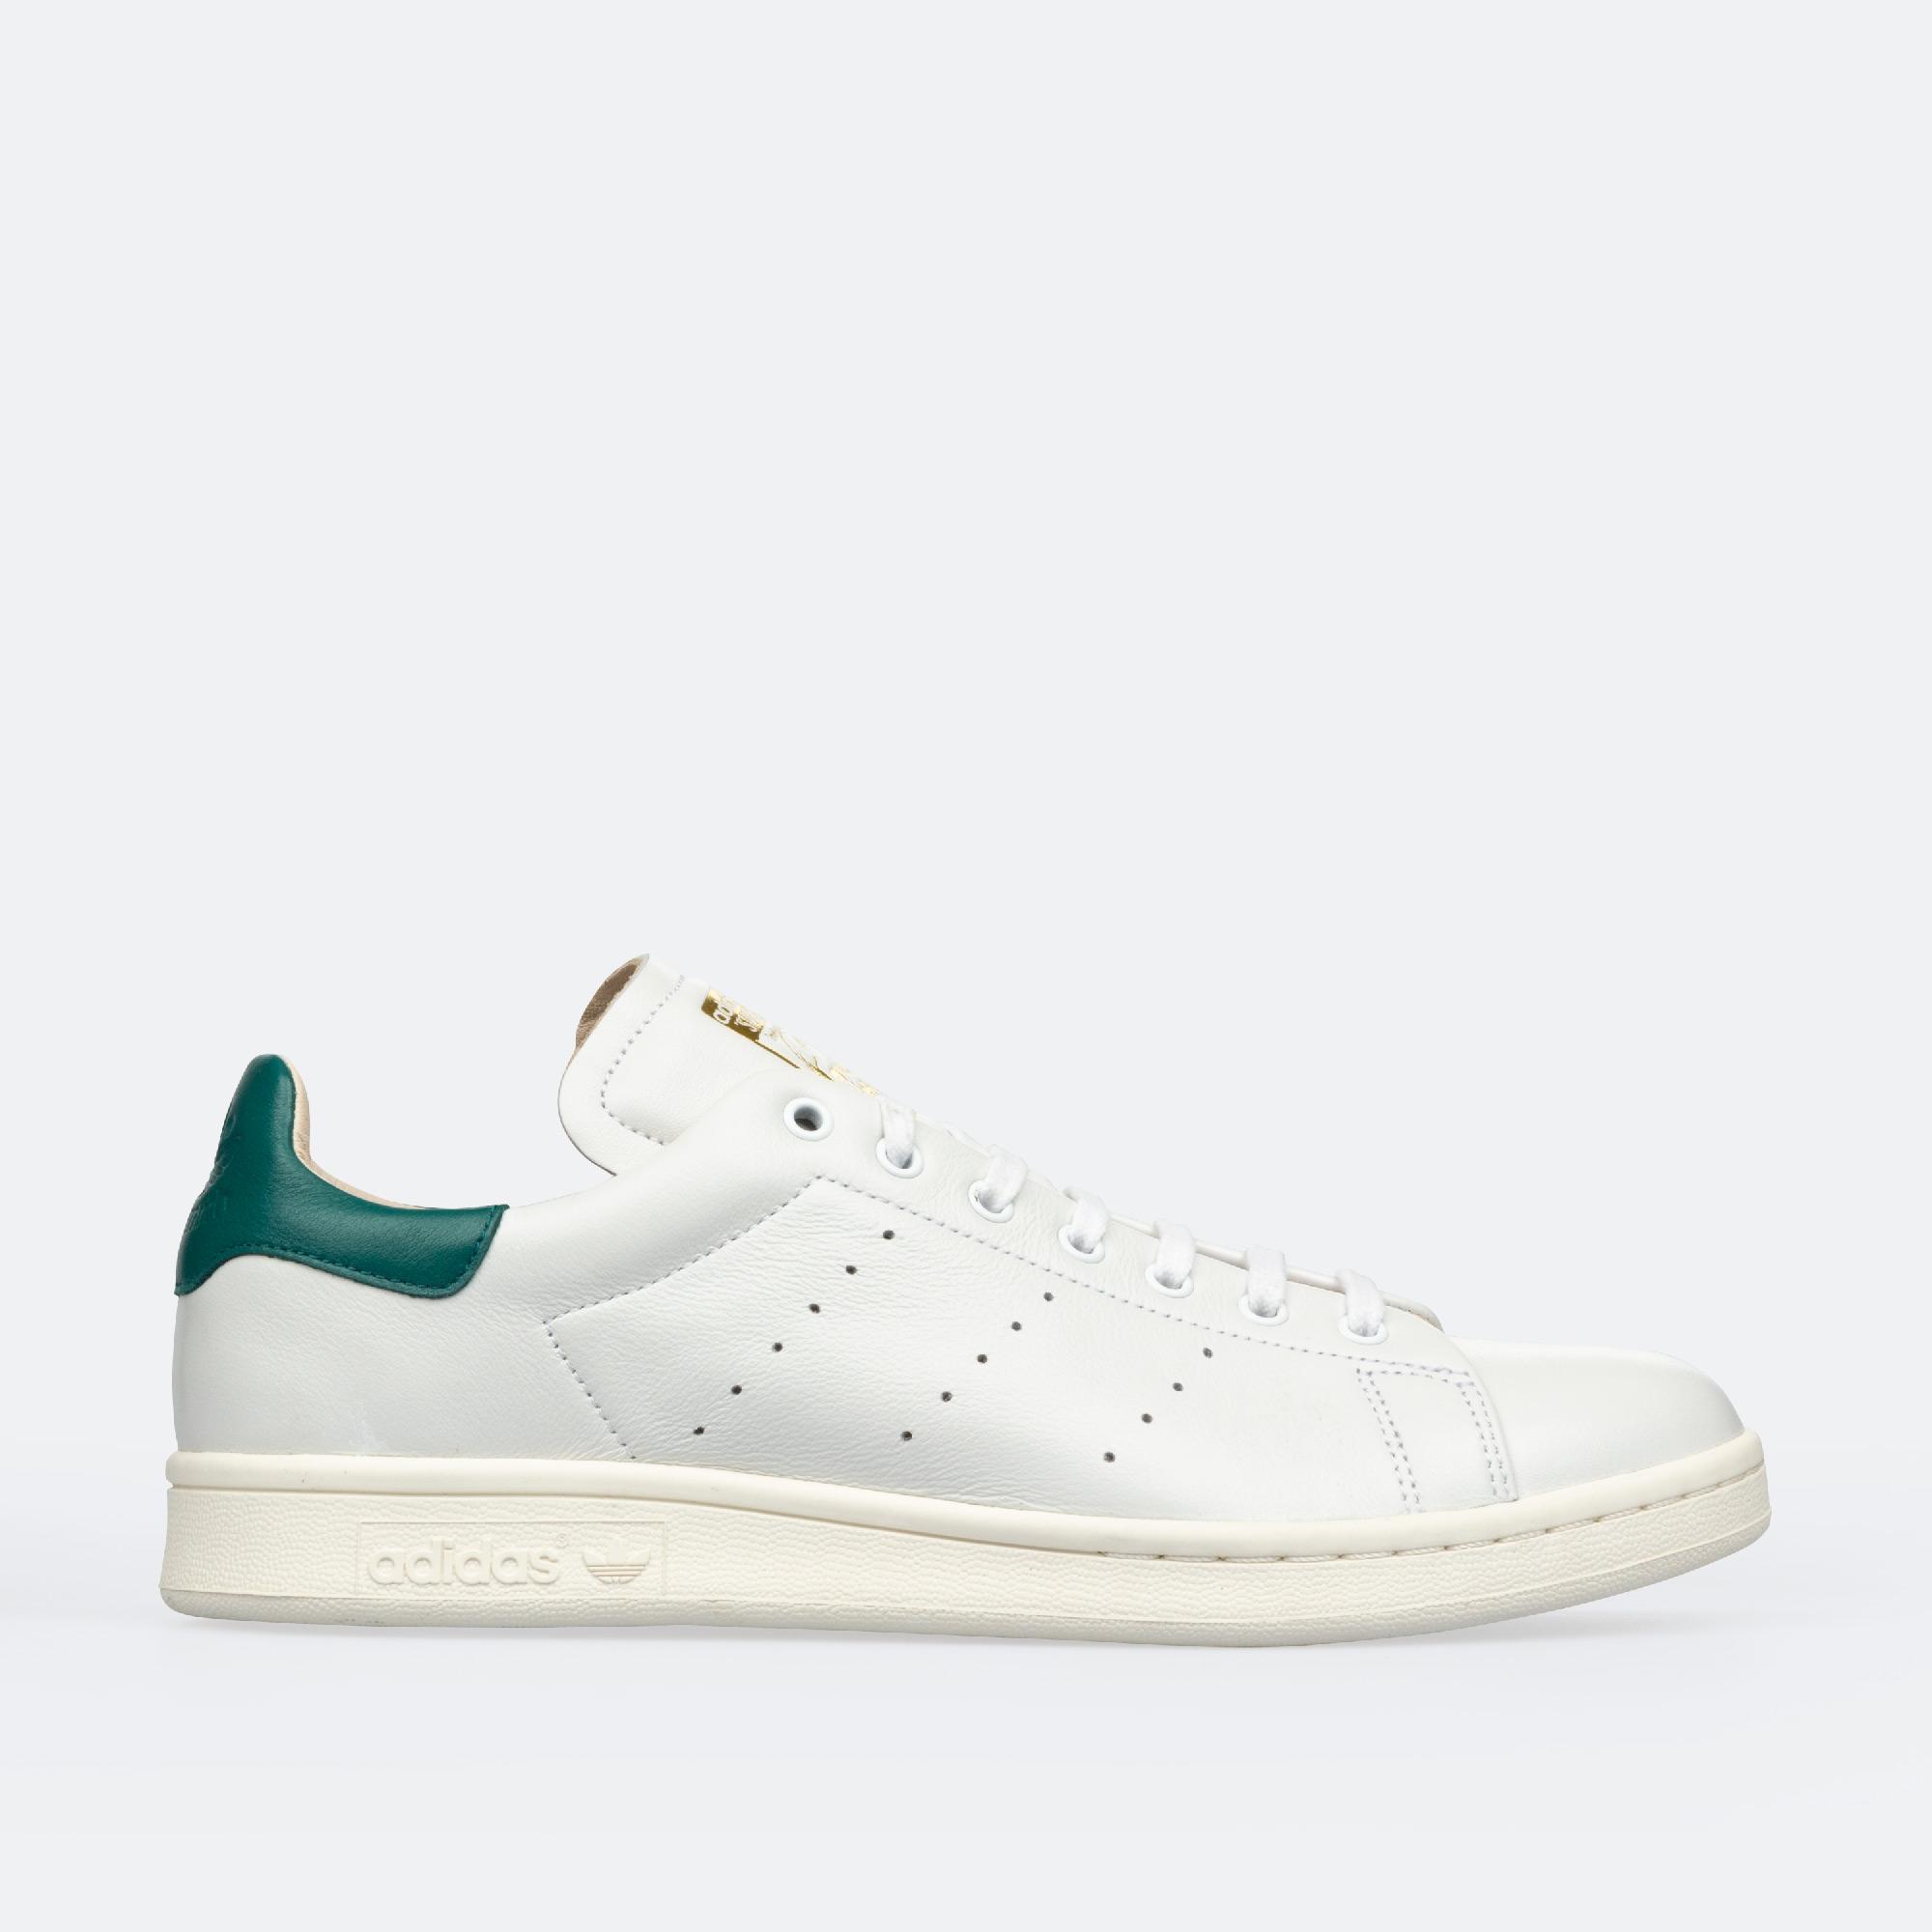 MONTGOMERY FIRENZE - Adidas originals - stan smith recon - White ... 3a70455a8